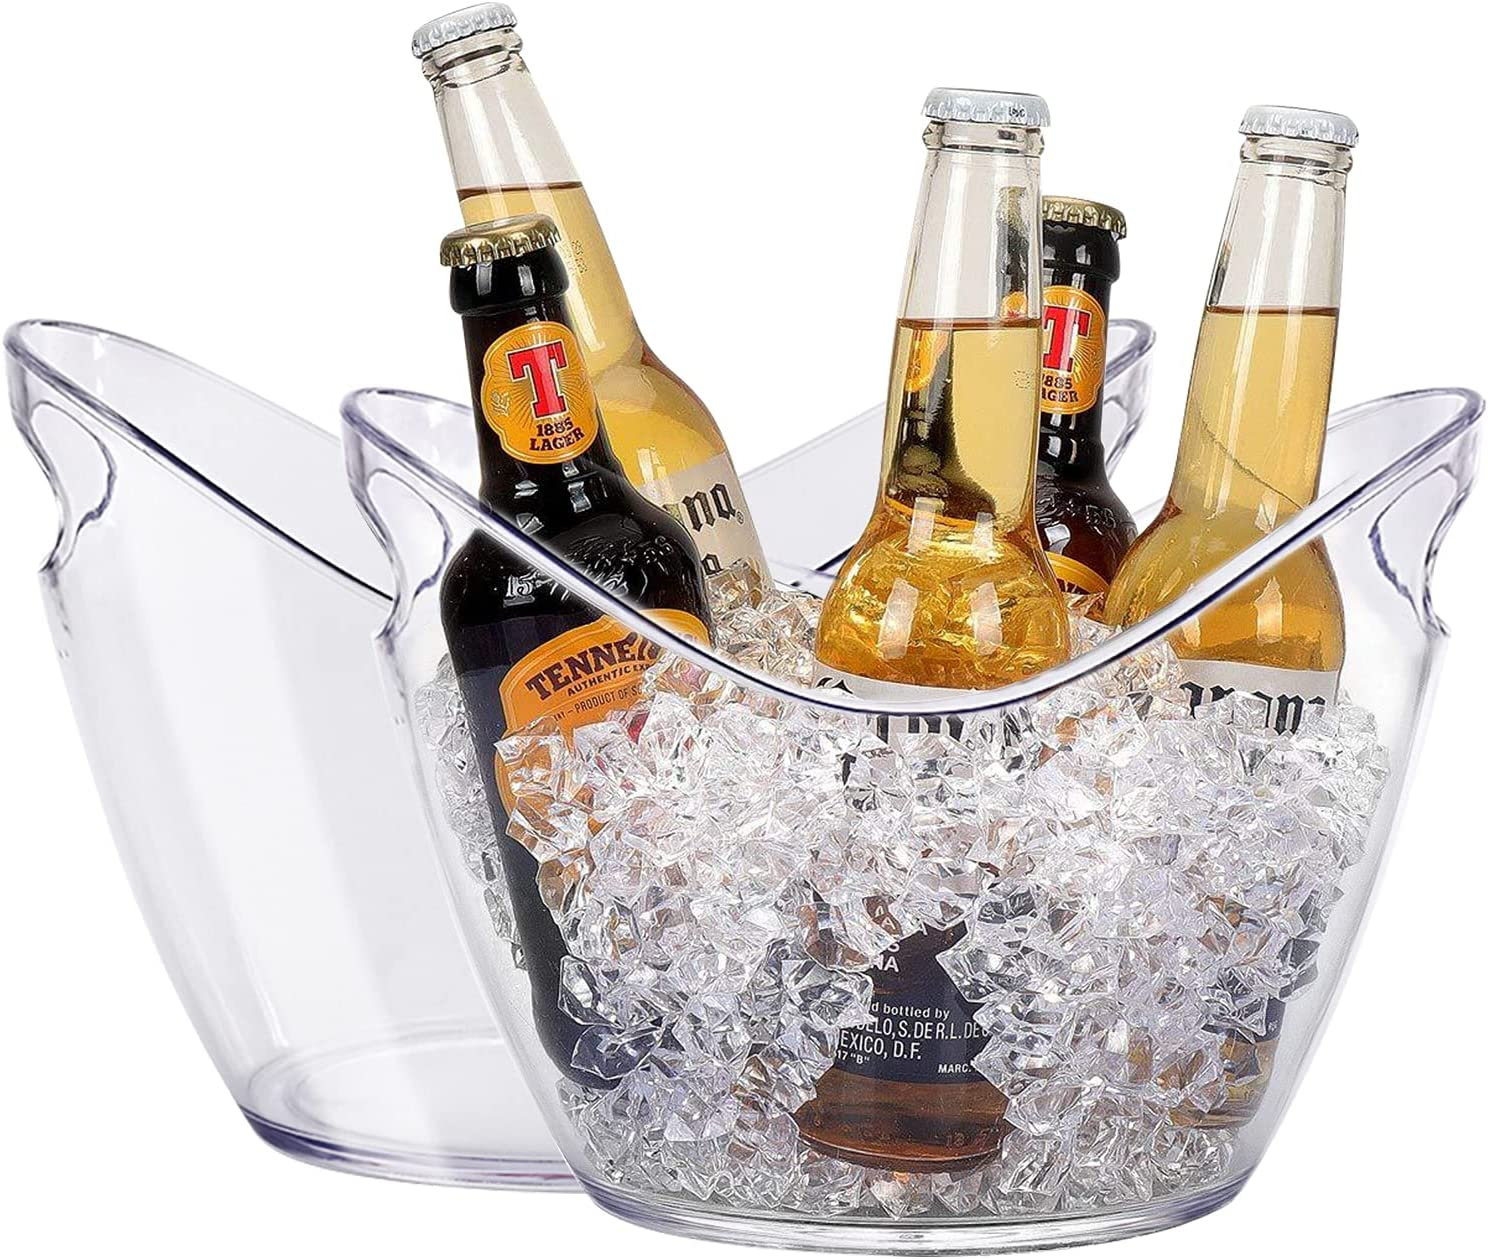 Plastic Oval Storage Tub,5 Liter Ice Buckets For Beer Bottle Drink Cooler,Party Beverage Chiller Bin,Storage Baskets,Clear Storage Bin with Handles For Kitchen,Cabinet,Large Pantry Organization 2sets